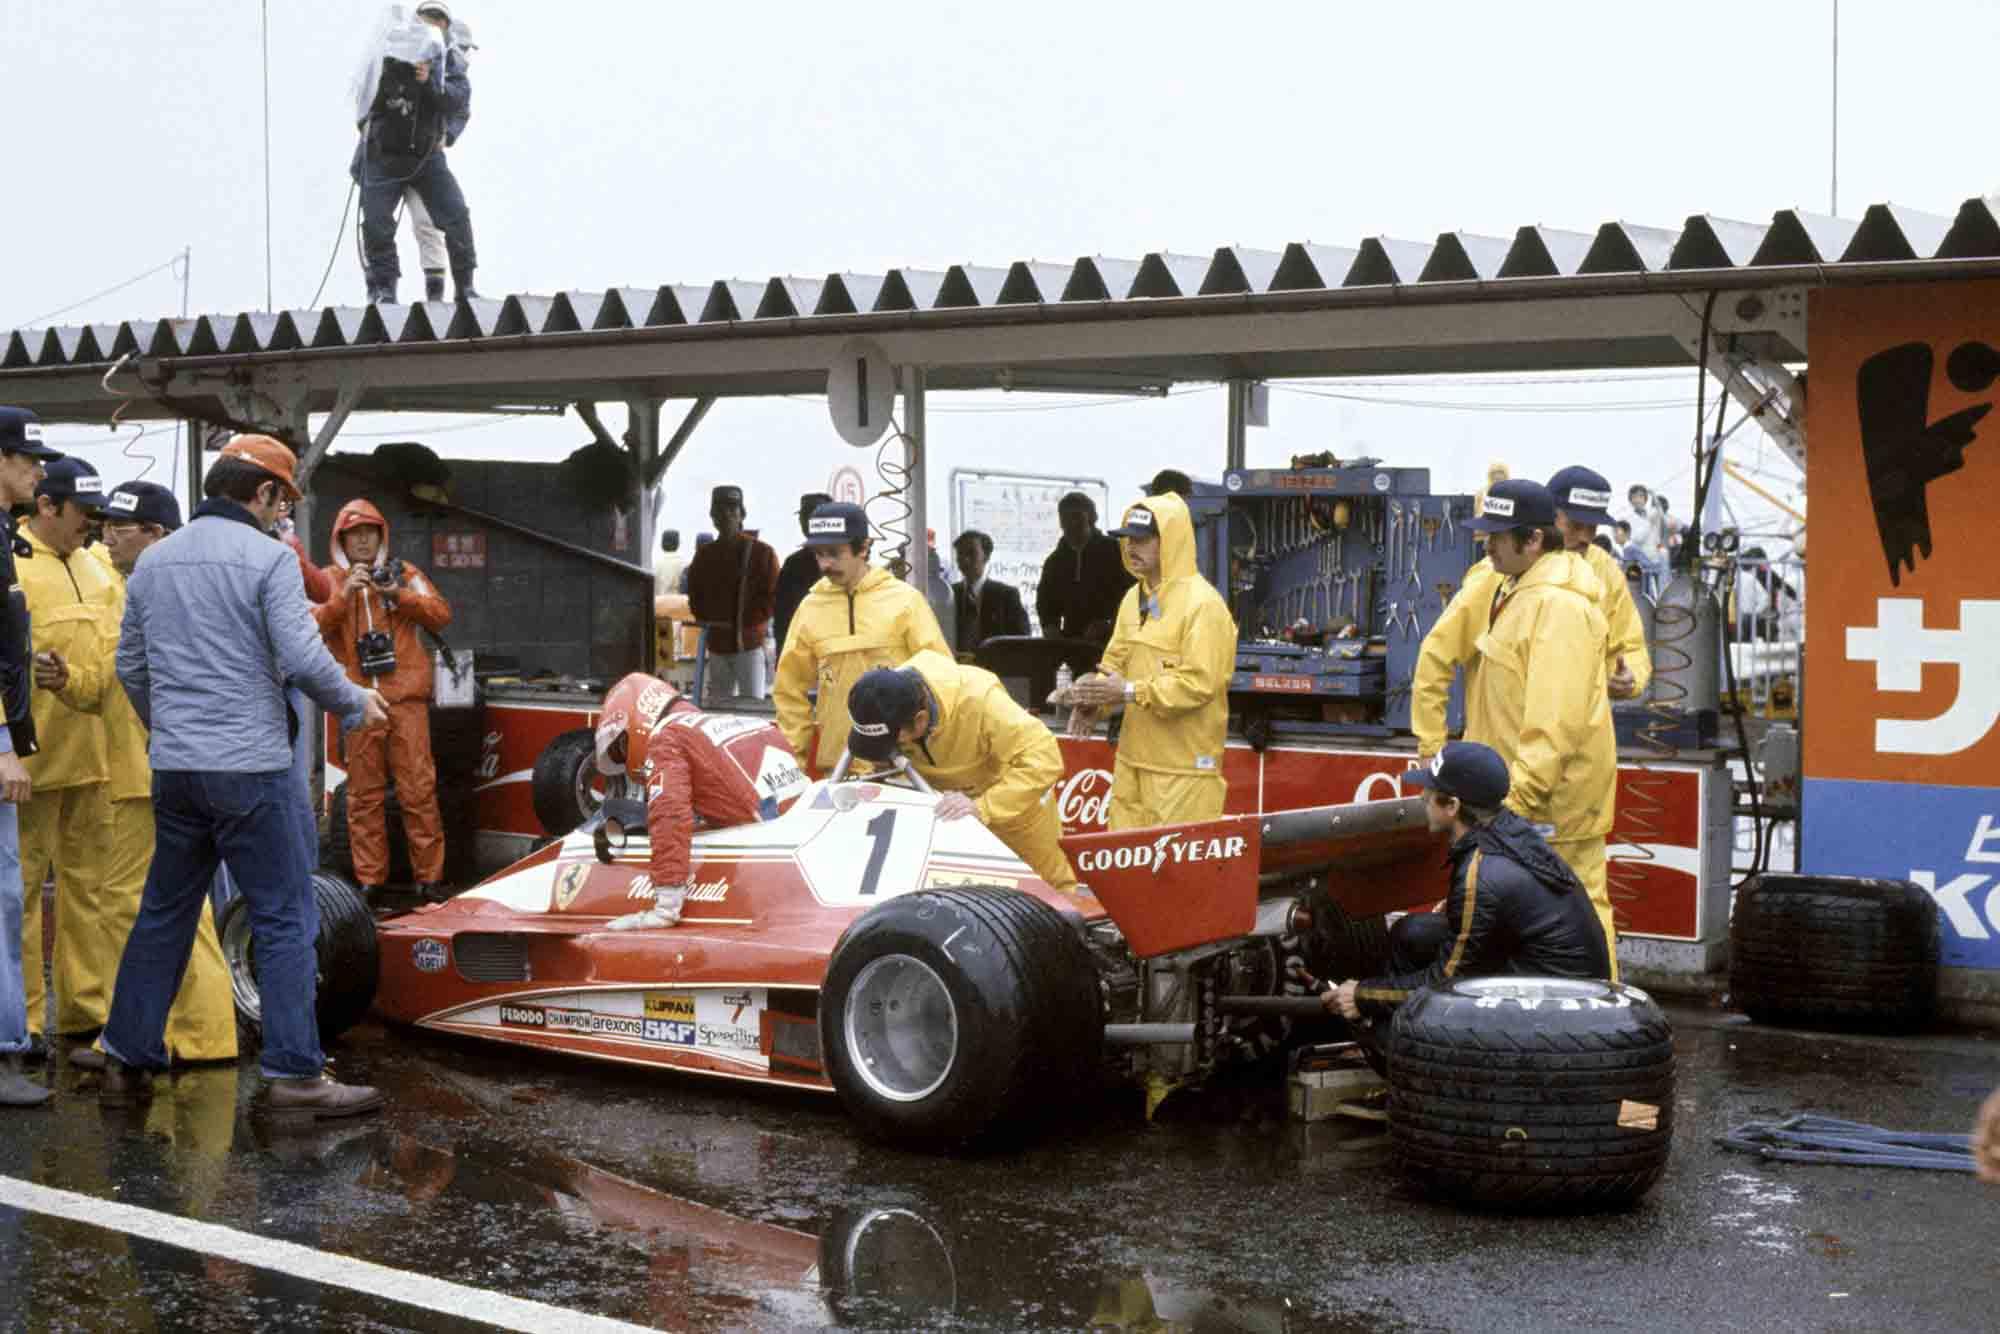 Niki Lauda climbs from his Ferrari, forfeiting the 1976 Japanese Grand Prix